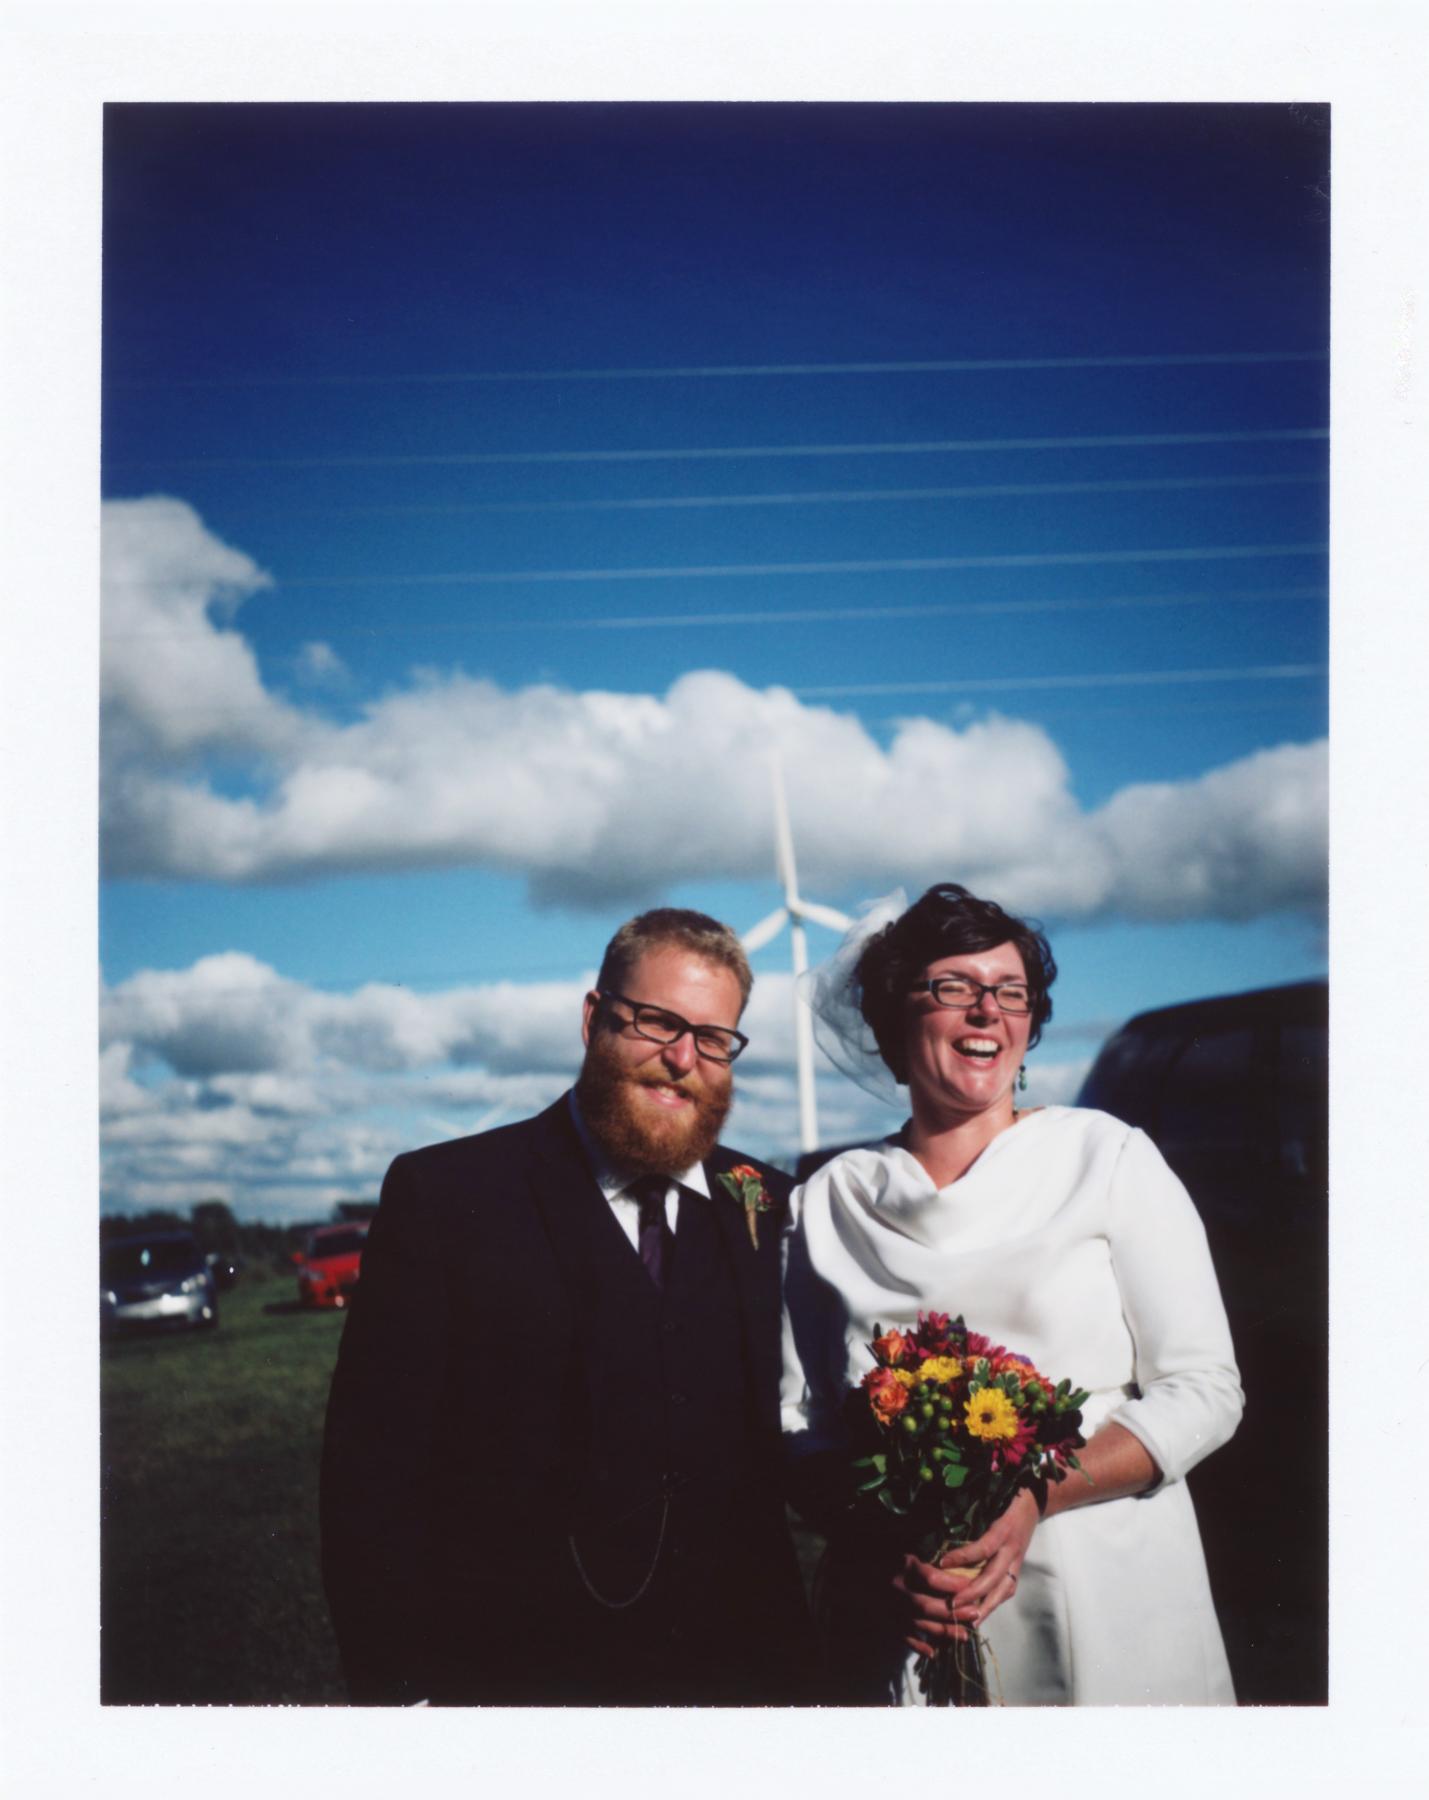 Wedding Day in Ludington | Polaroid Land Autoomatic 100 - Fuji FP100C | Gina Gorsek